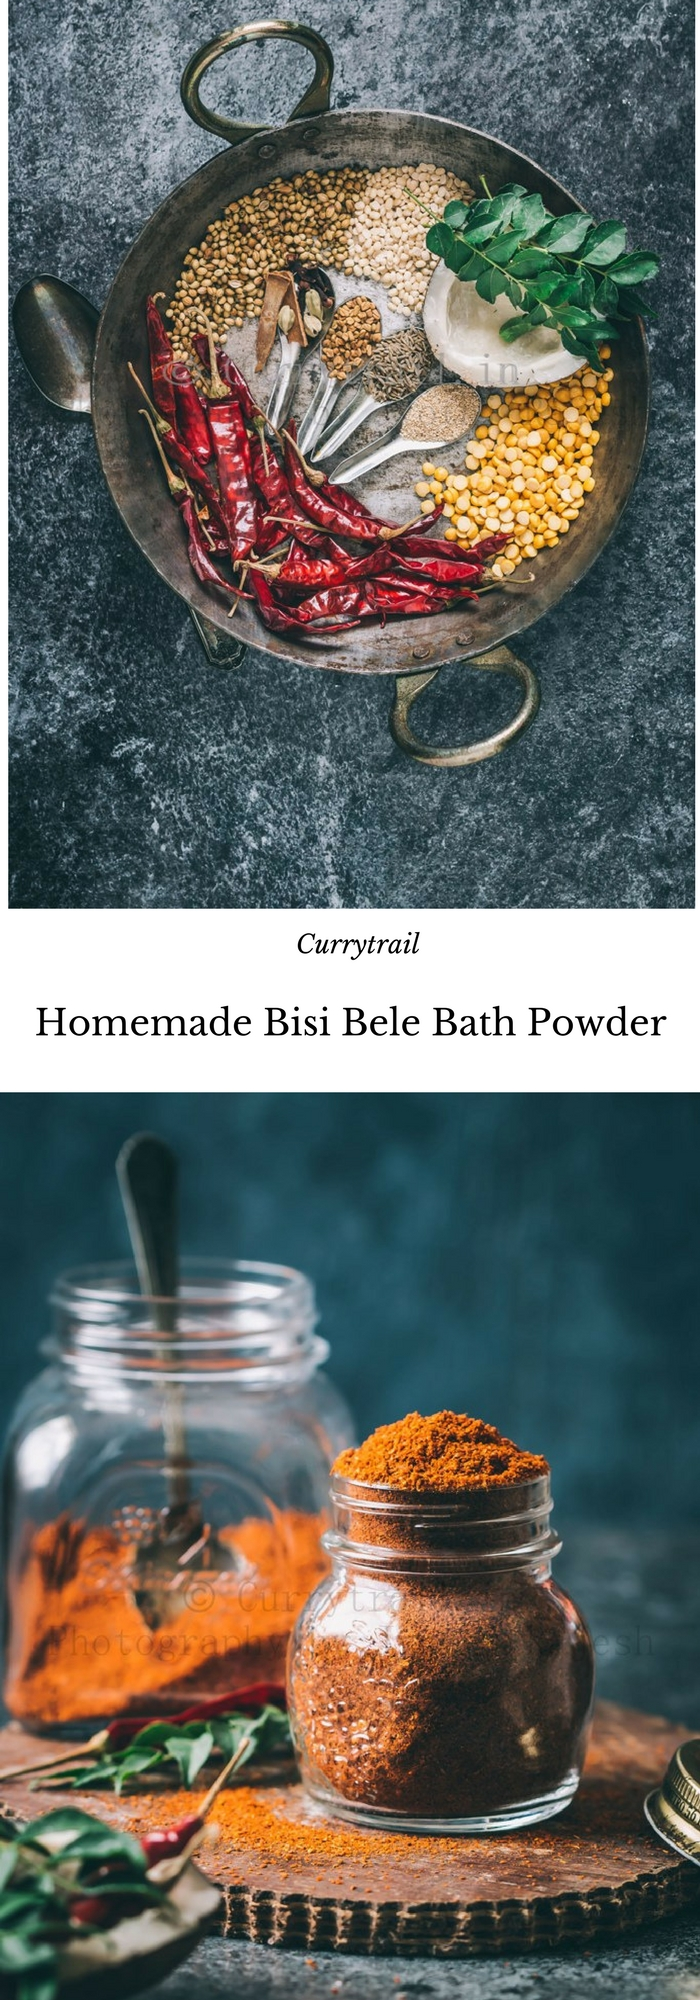 Homemade Bisi Bele Bath Powder